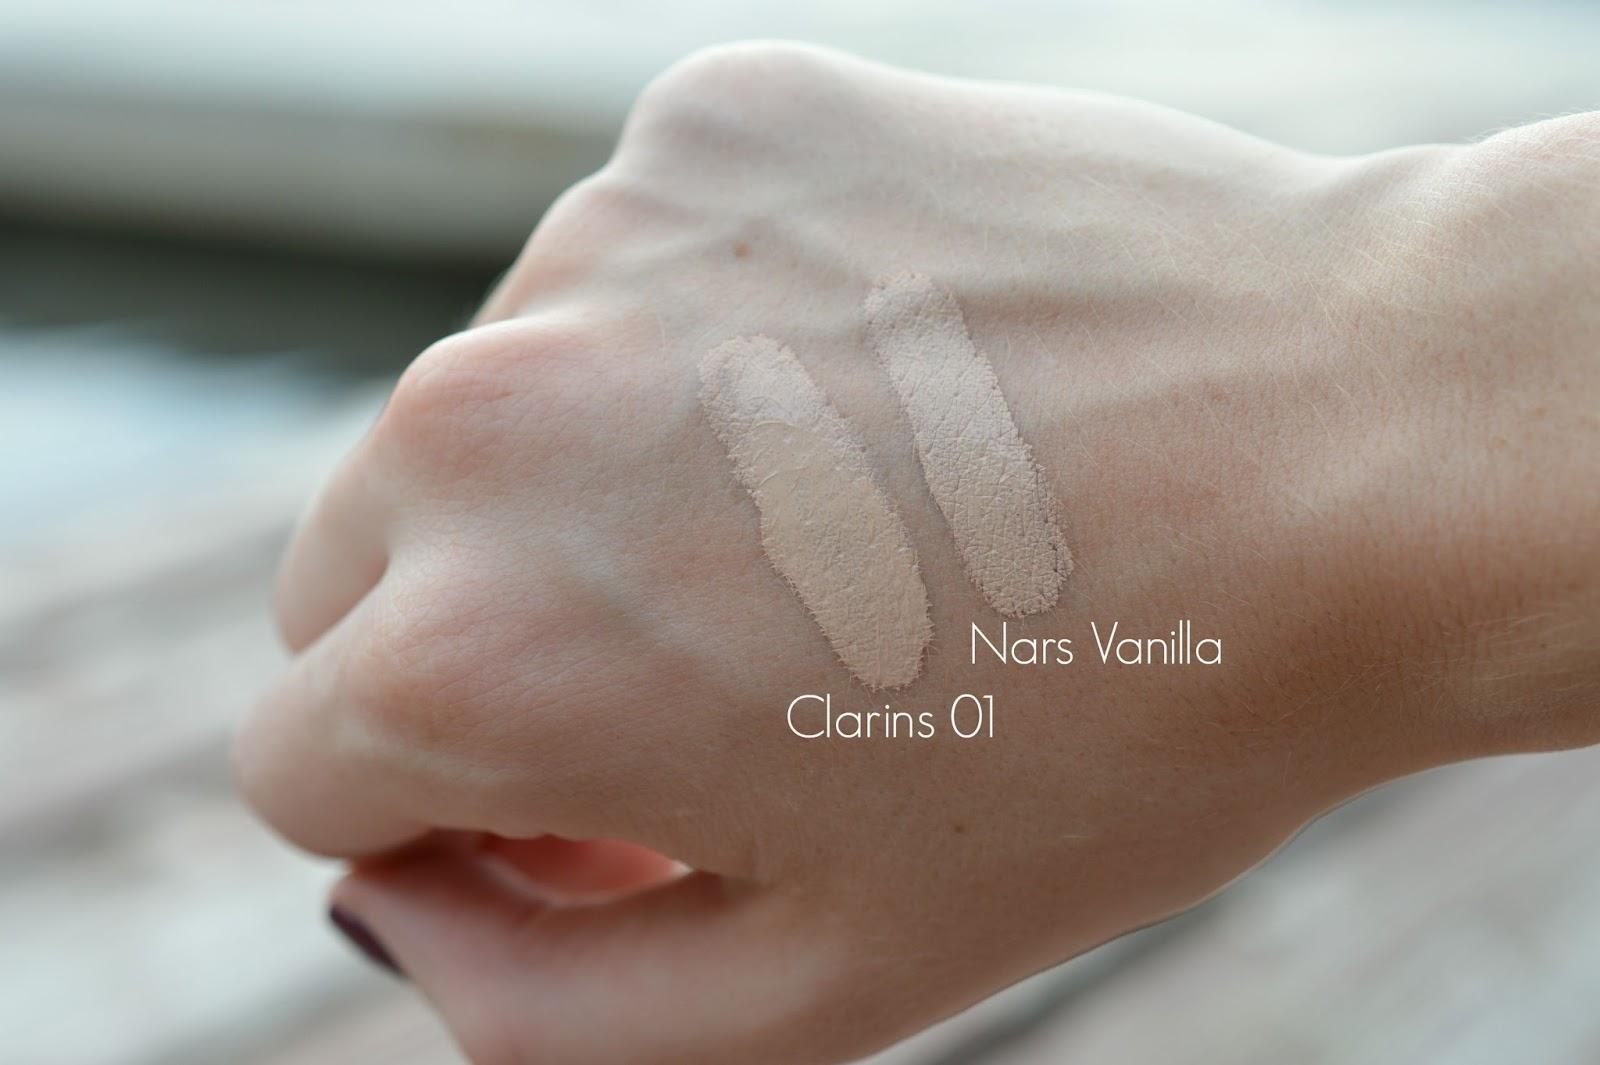 clarins instant concealer 01 swatch